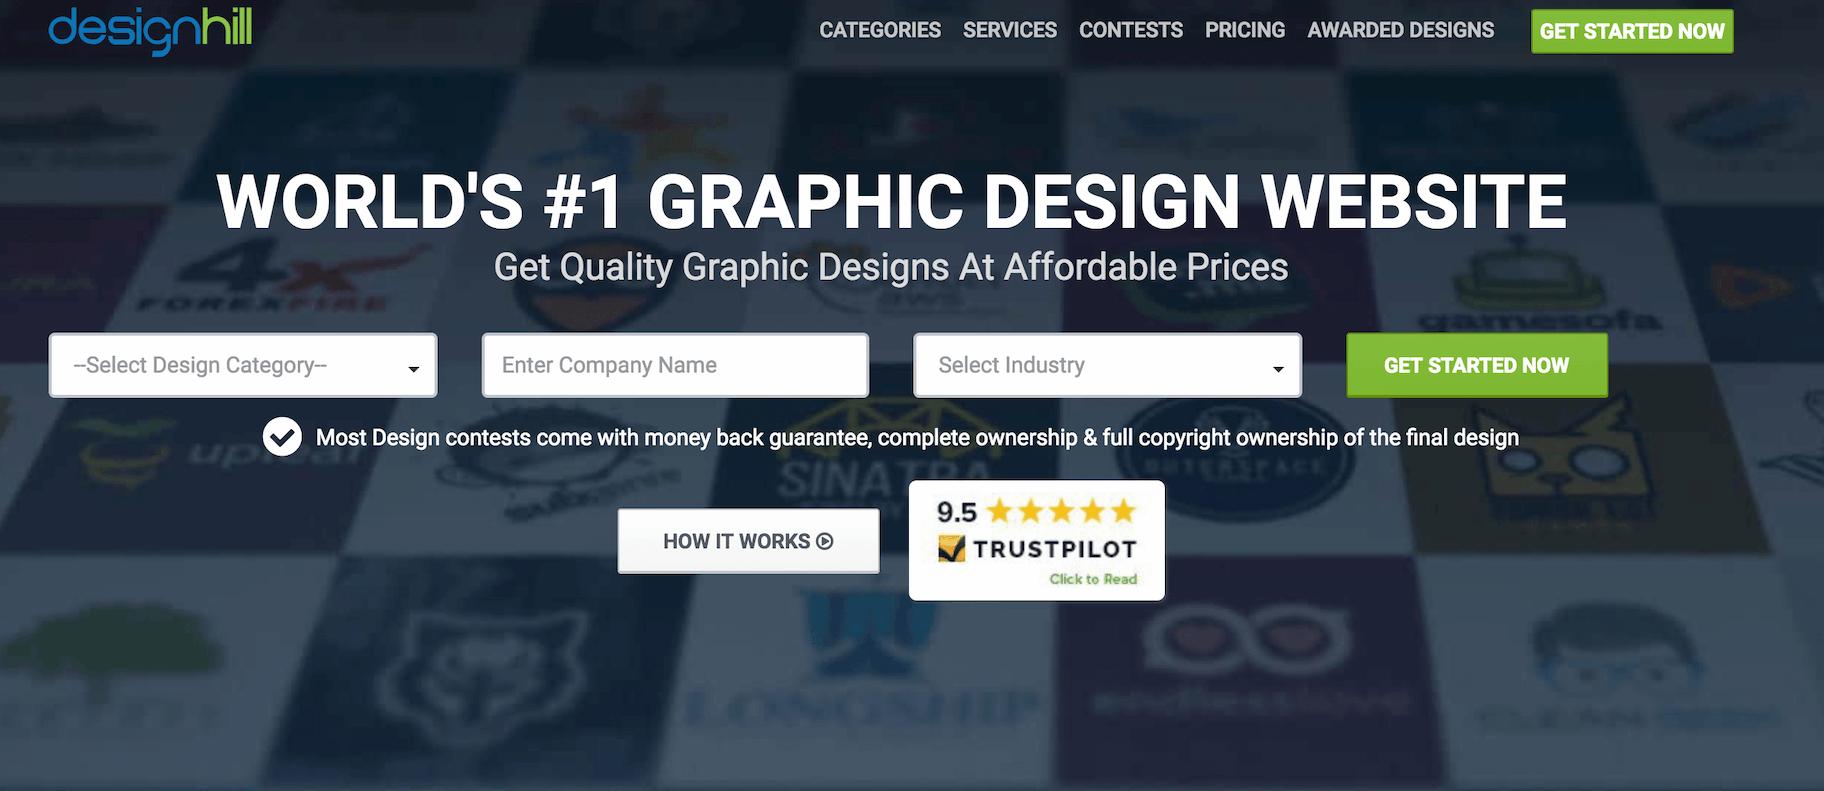 Design Hill Best Free Online Maker